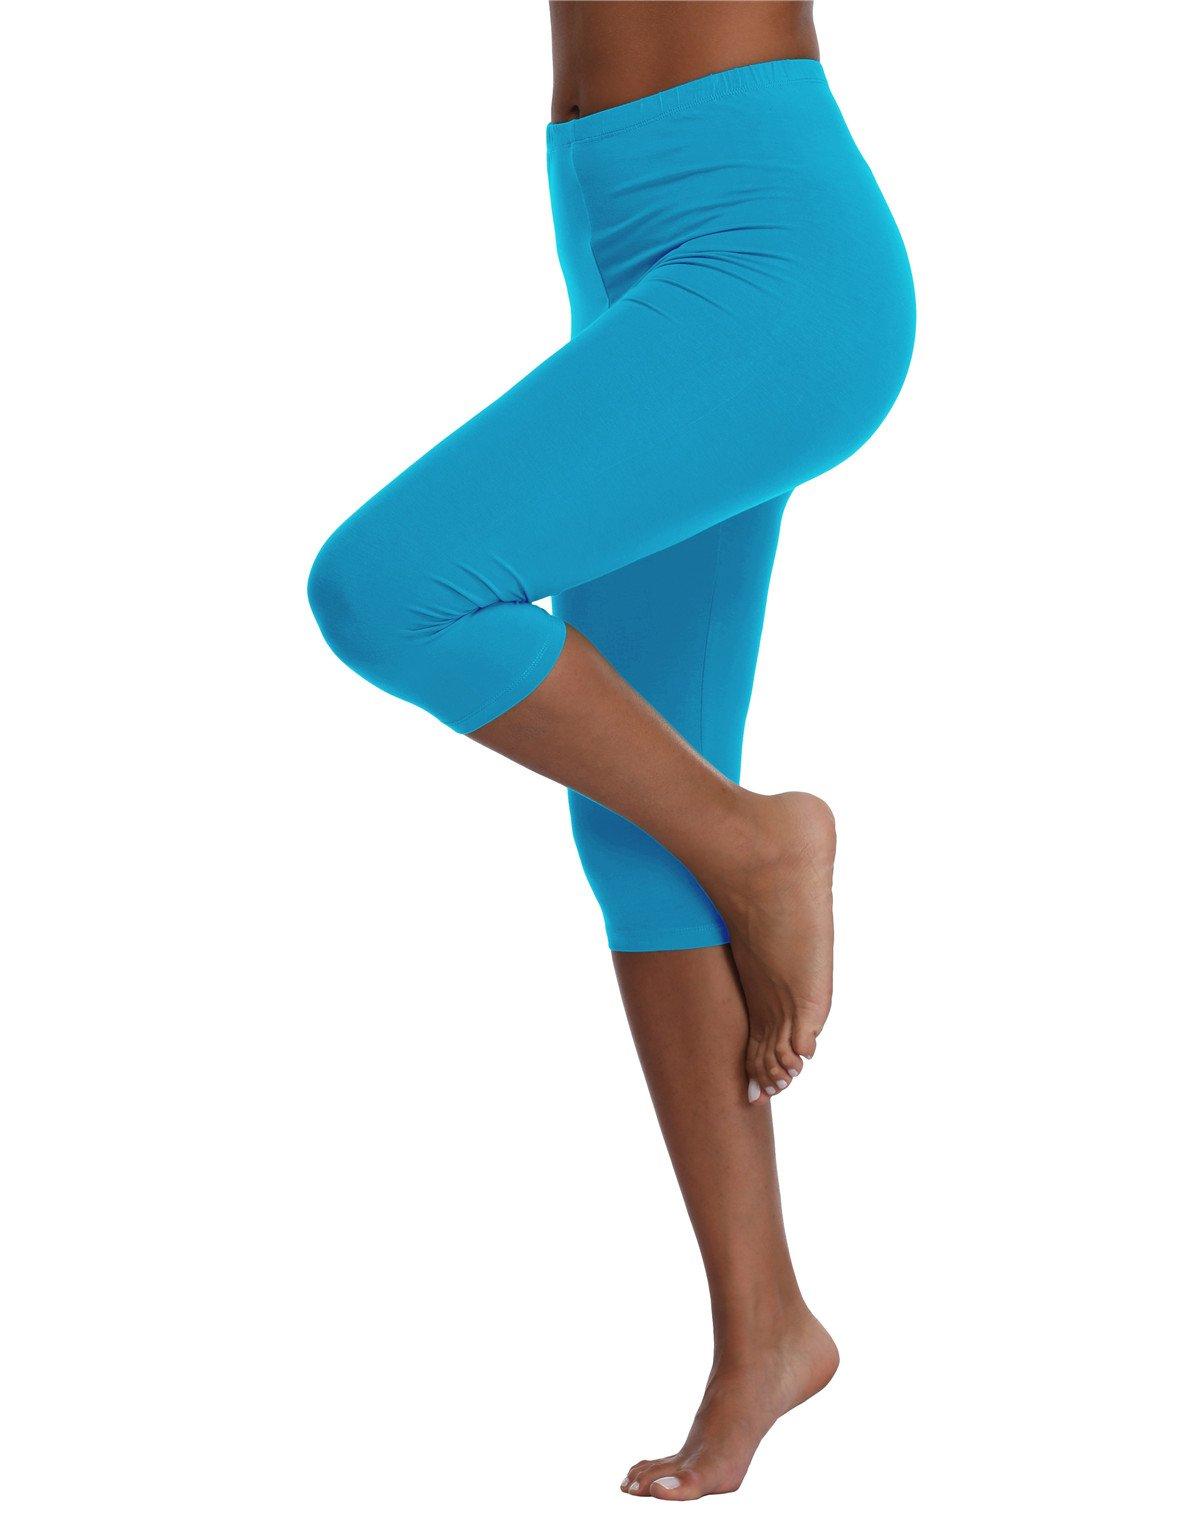 Kotii Women's Summer Lightweight Capri Leggings Plus Size Crop Leggings Stretch Tights Pants,Light Blue,Fits S-M